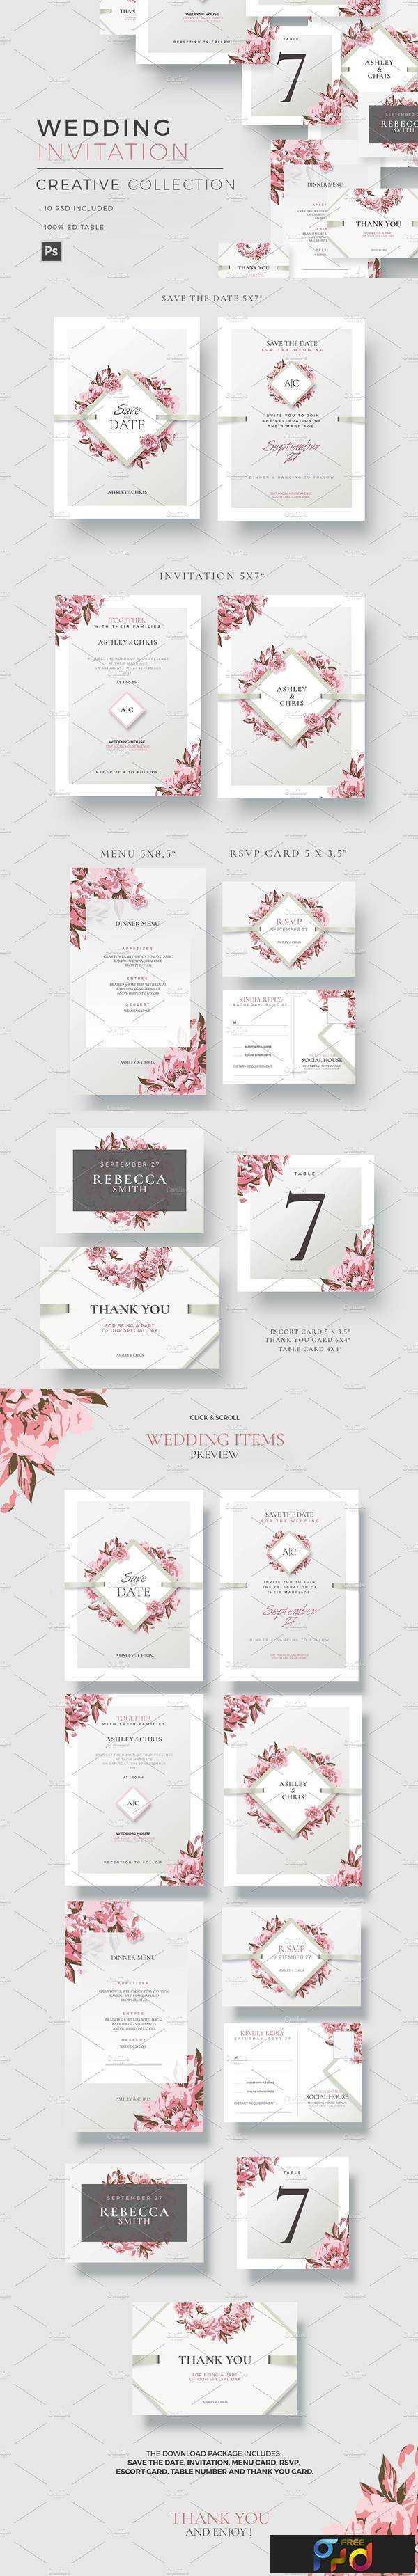 1806038 Creative Wedding - Invitations 1590626 1